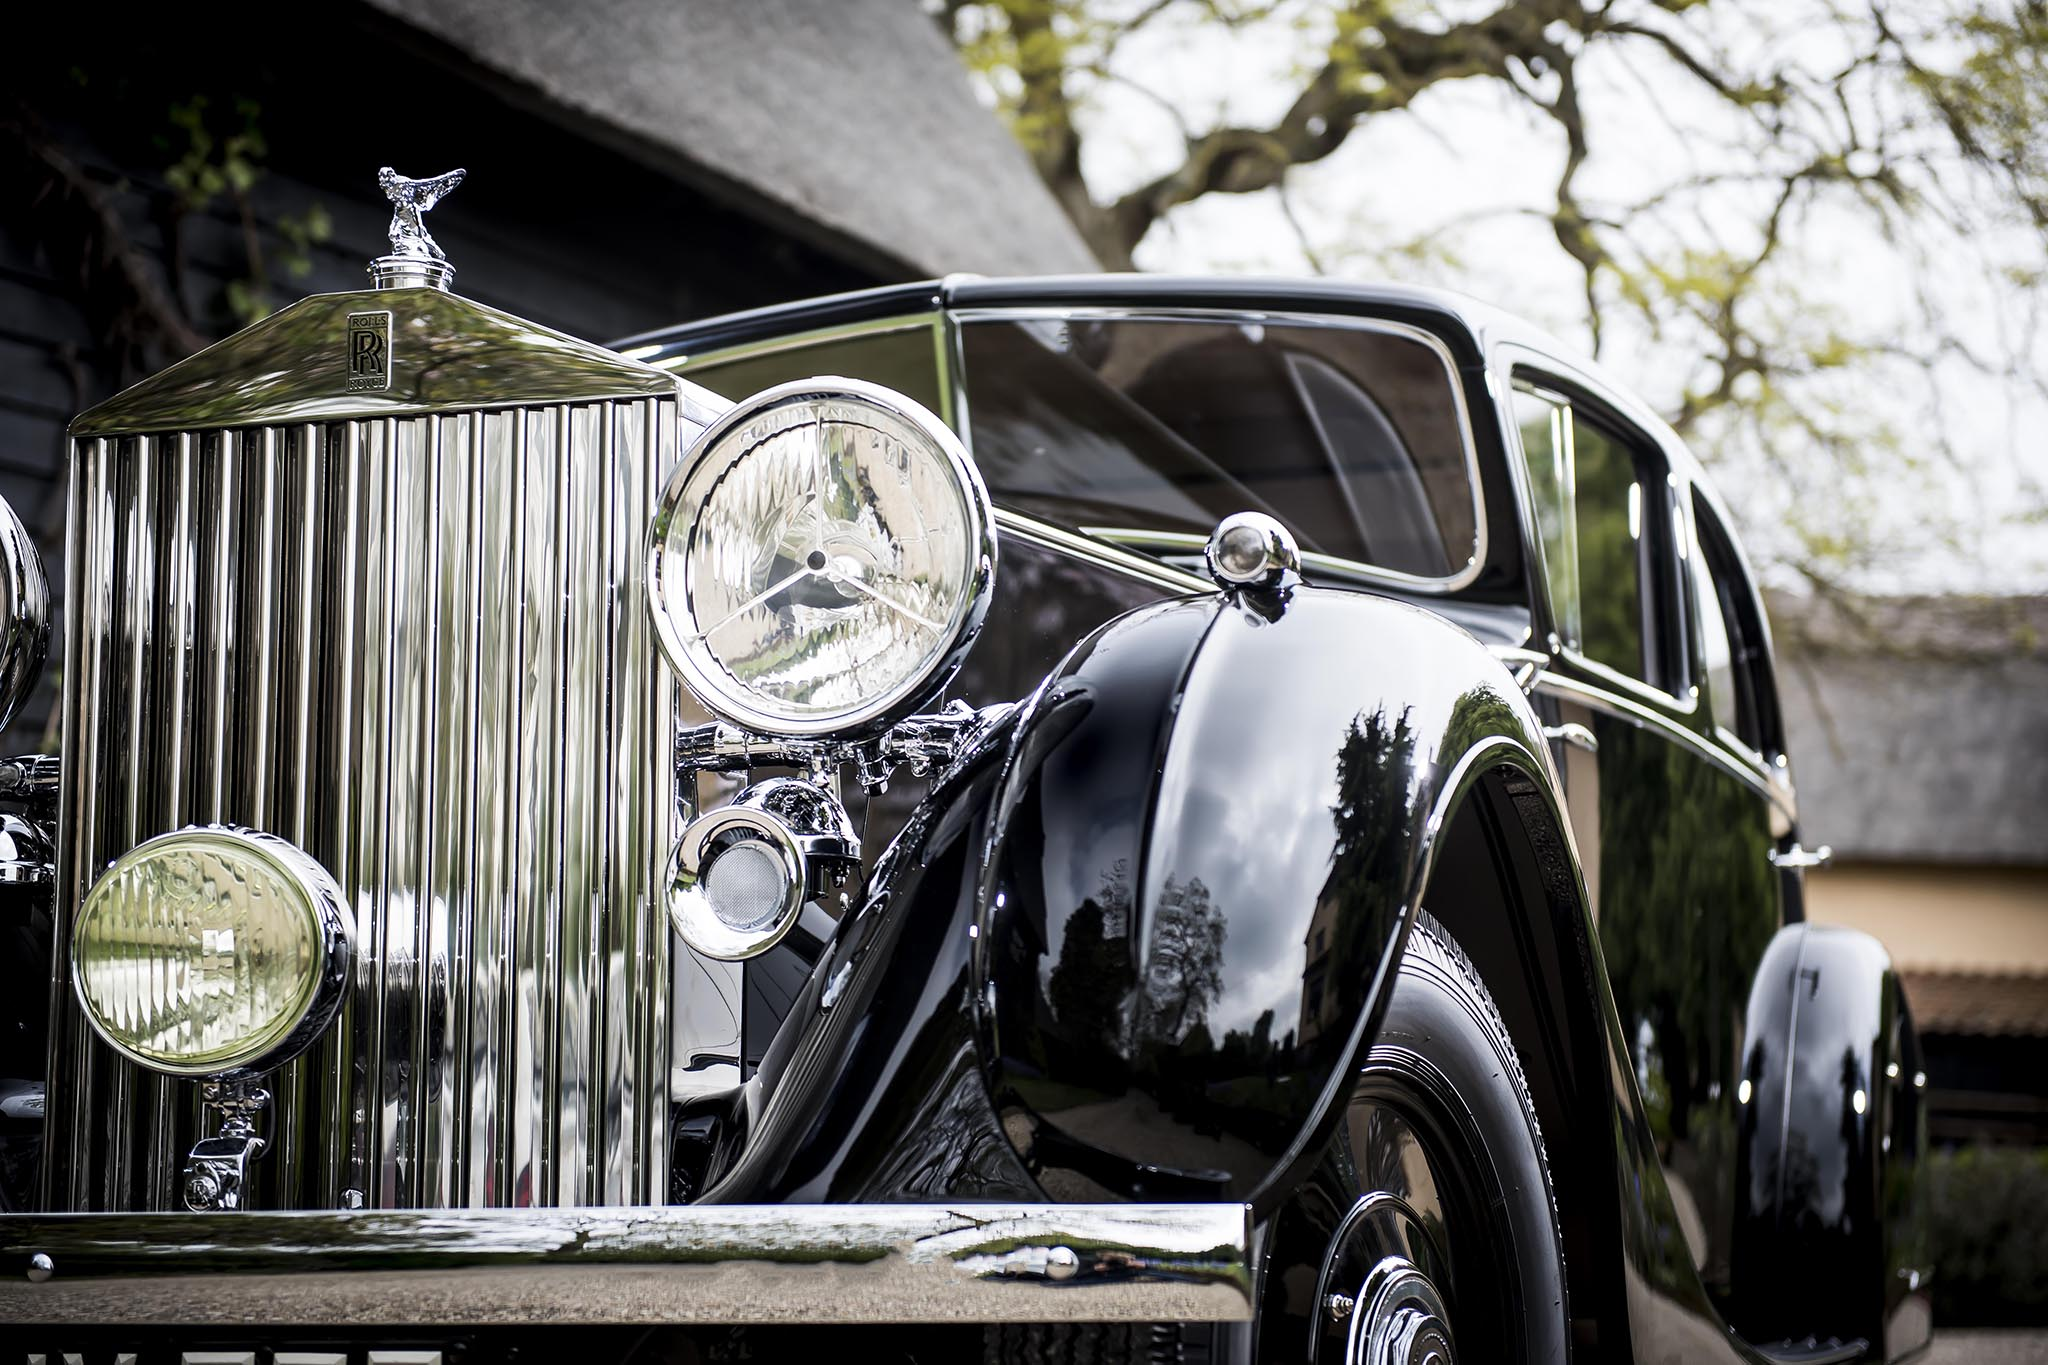 1936 Rolls Royce Phantom Iii Owned By Field Marshal